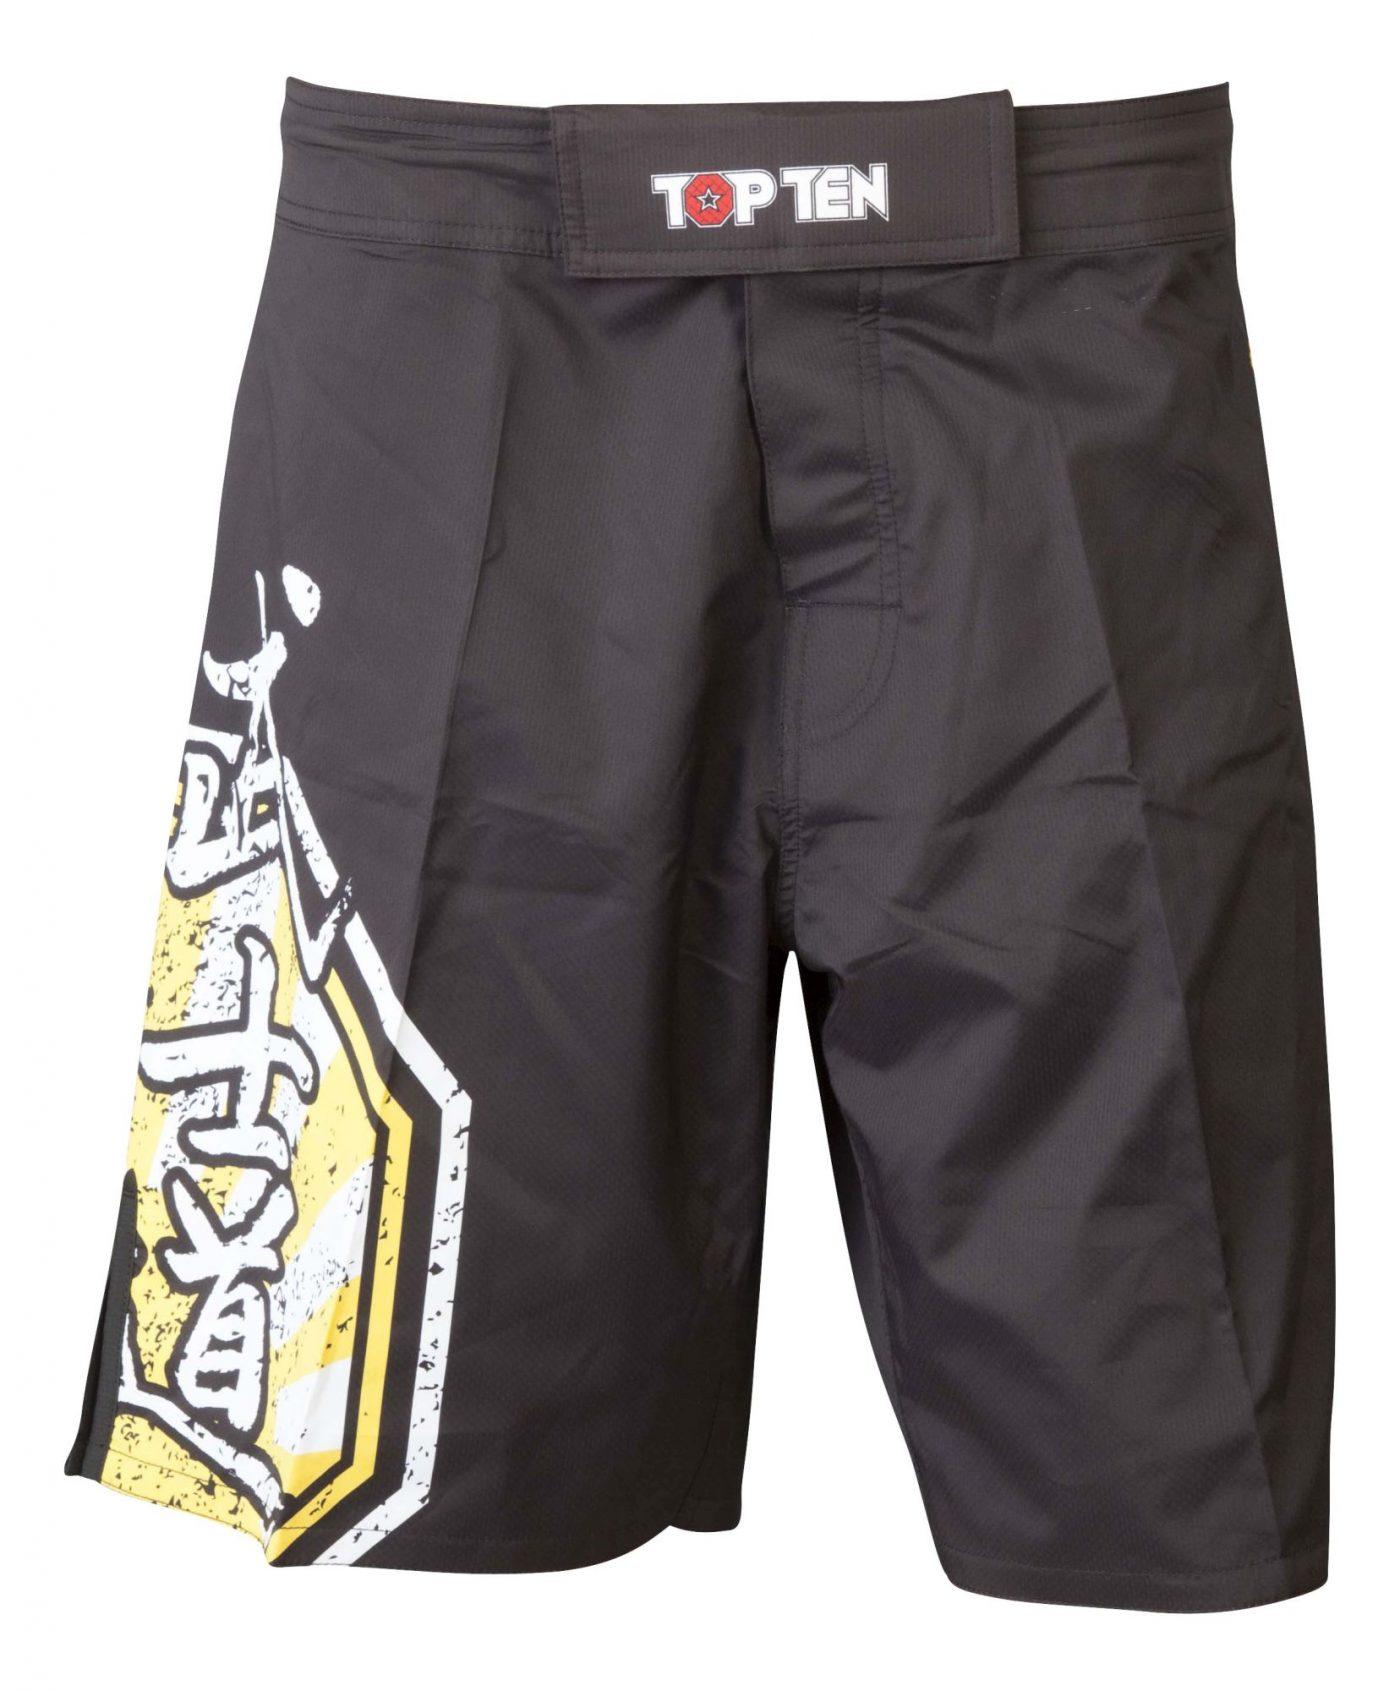 "TOP TEN MMA MMA broekje ""Sunrise"" Zwart - Geel"